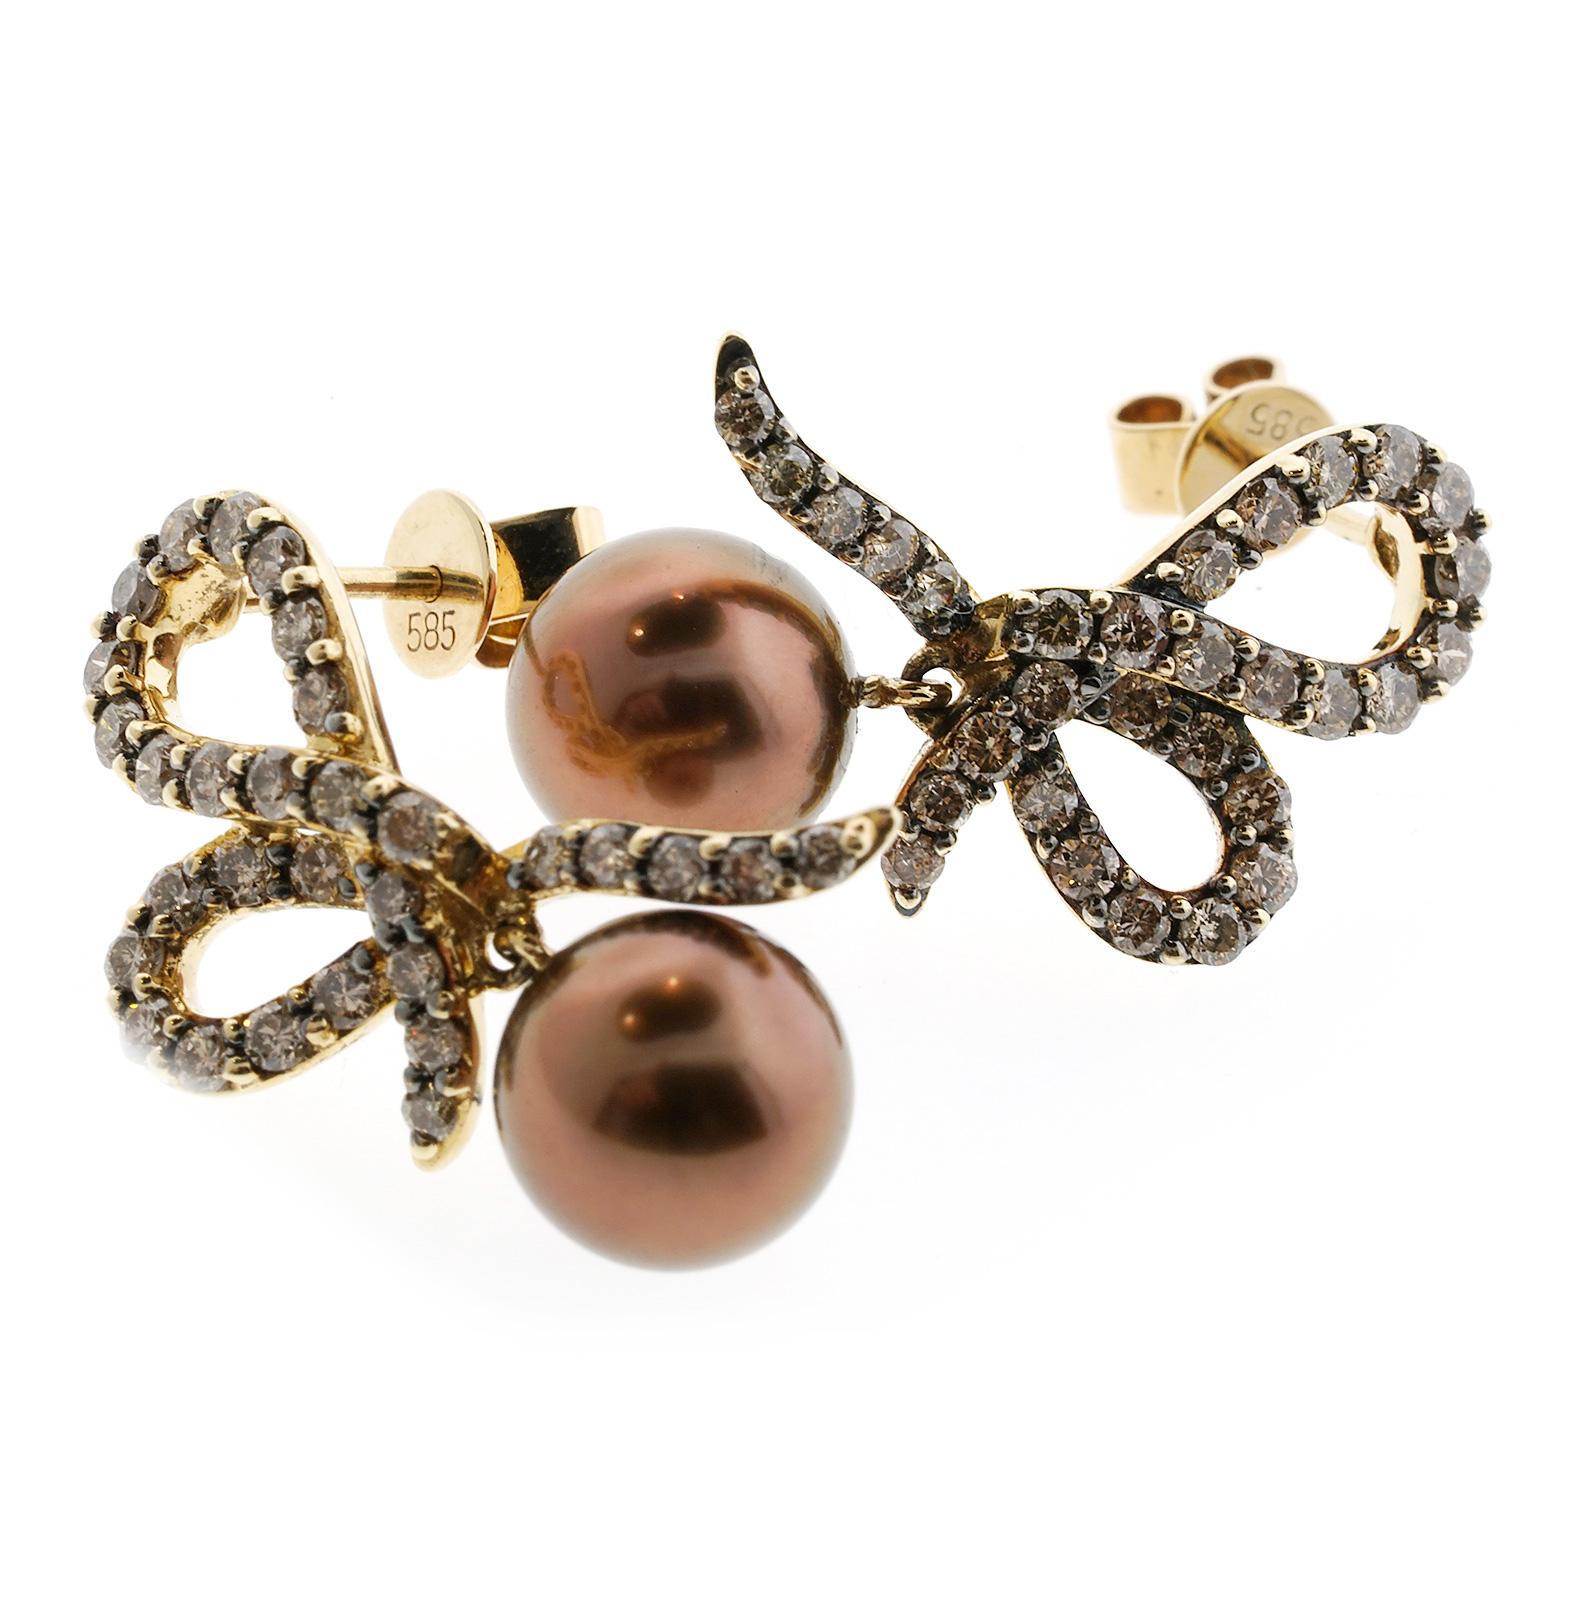 levian encore pearl and chocolate diamond earrings 4995. Black Bedroom Furniture Sets. Home Design Ideas